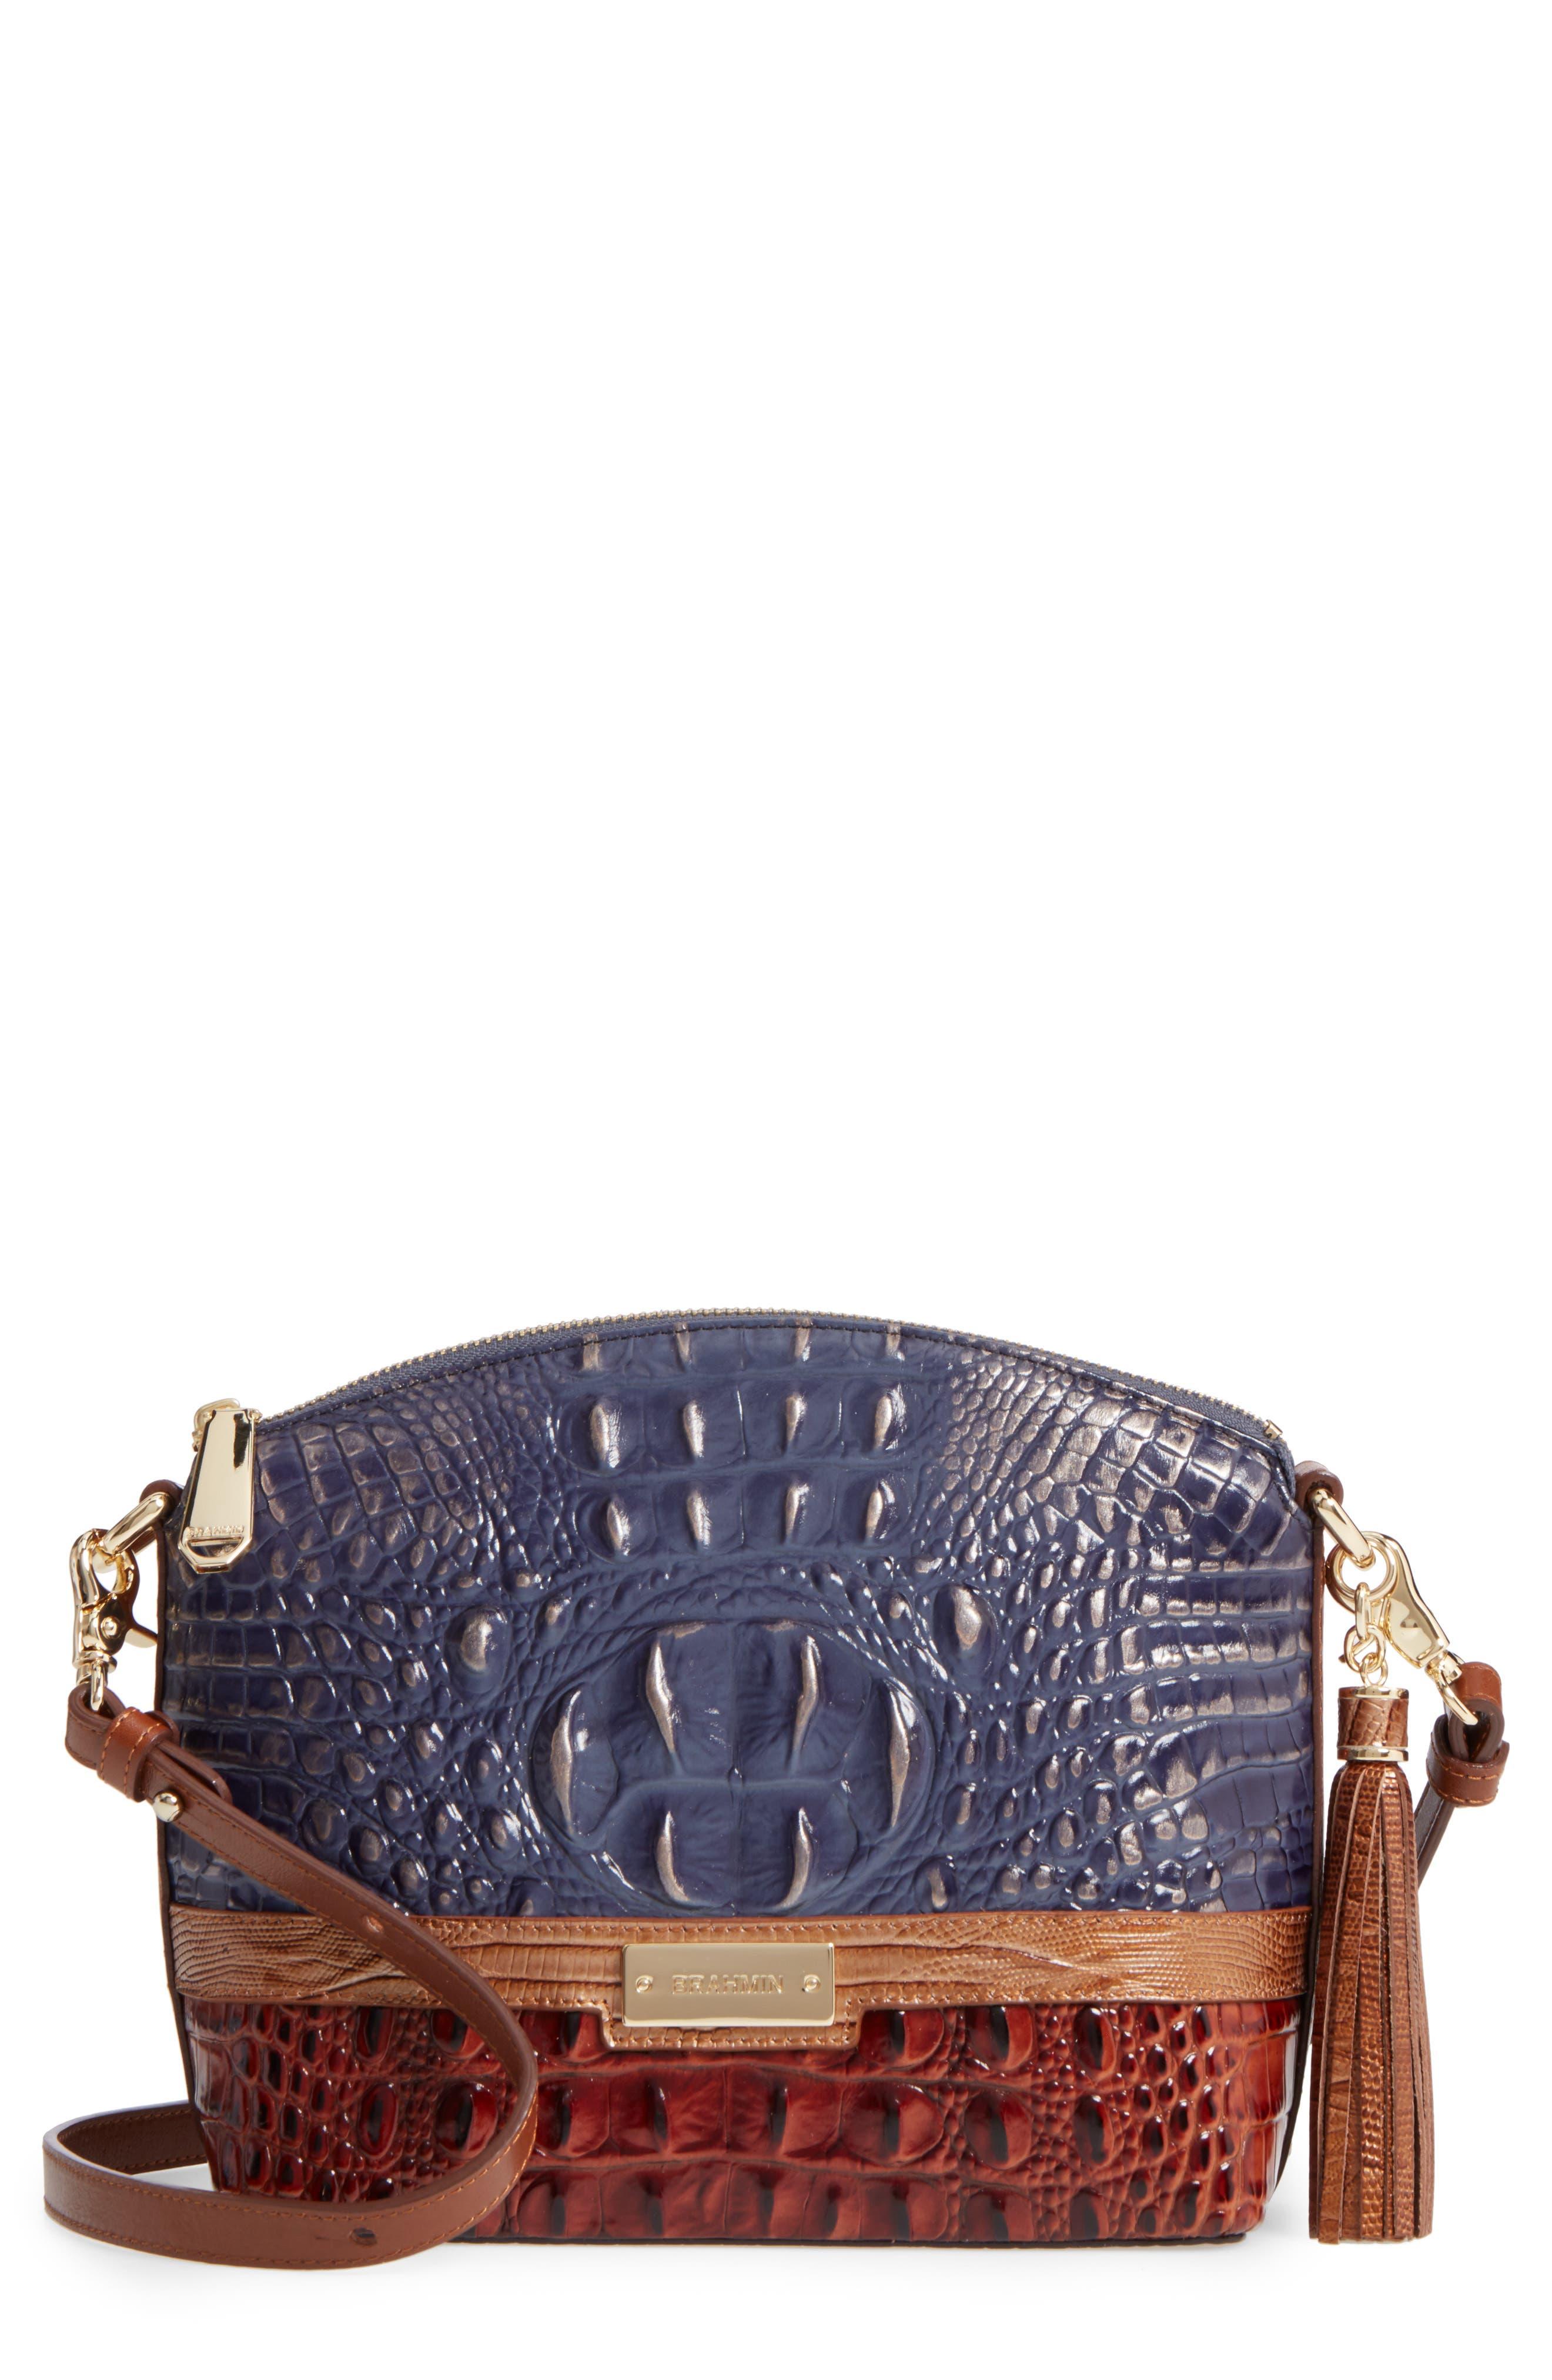 Brahmin Andesite Lucino - Mini Duxbury Leather Crossbody Bag